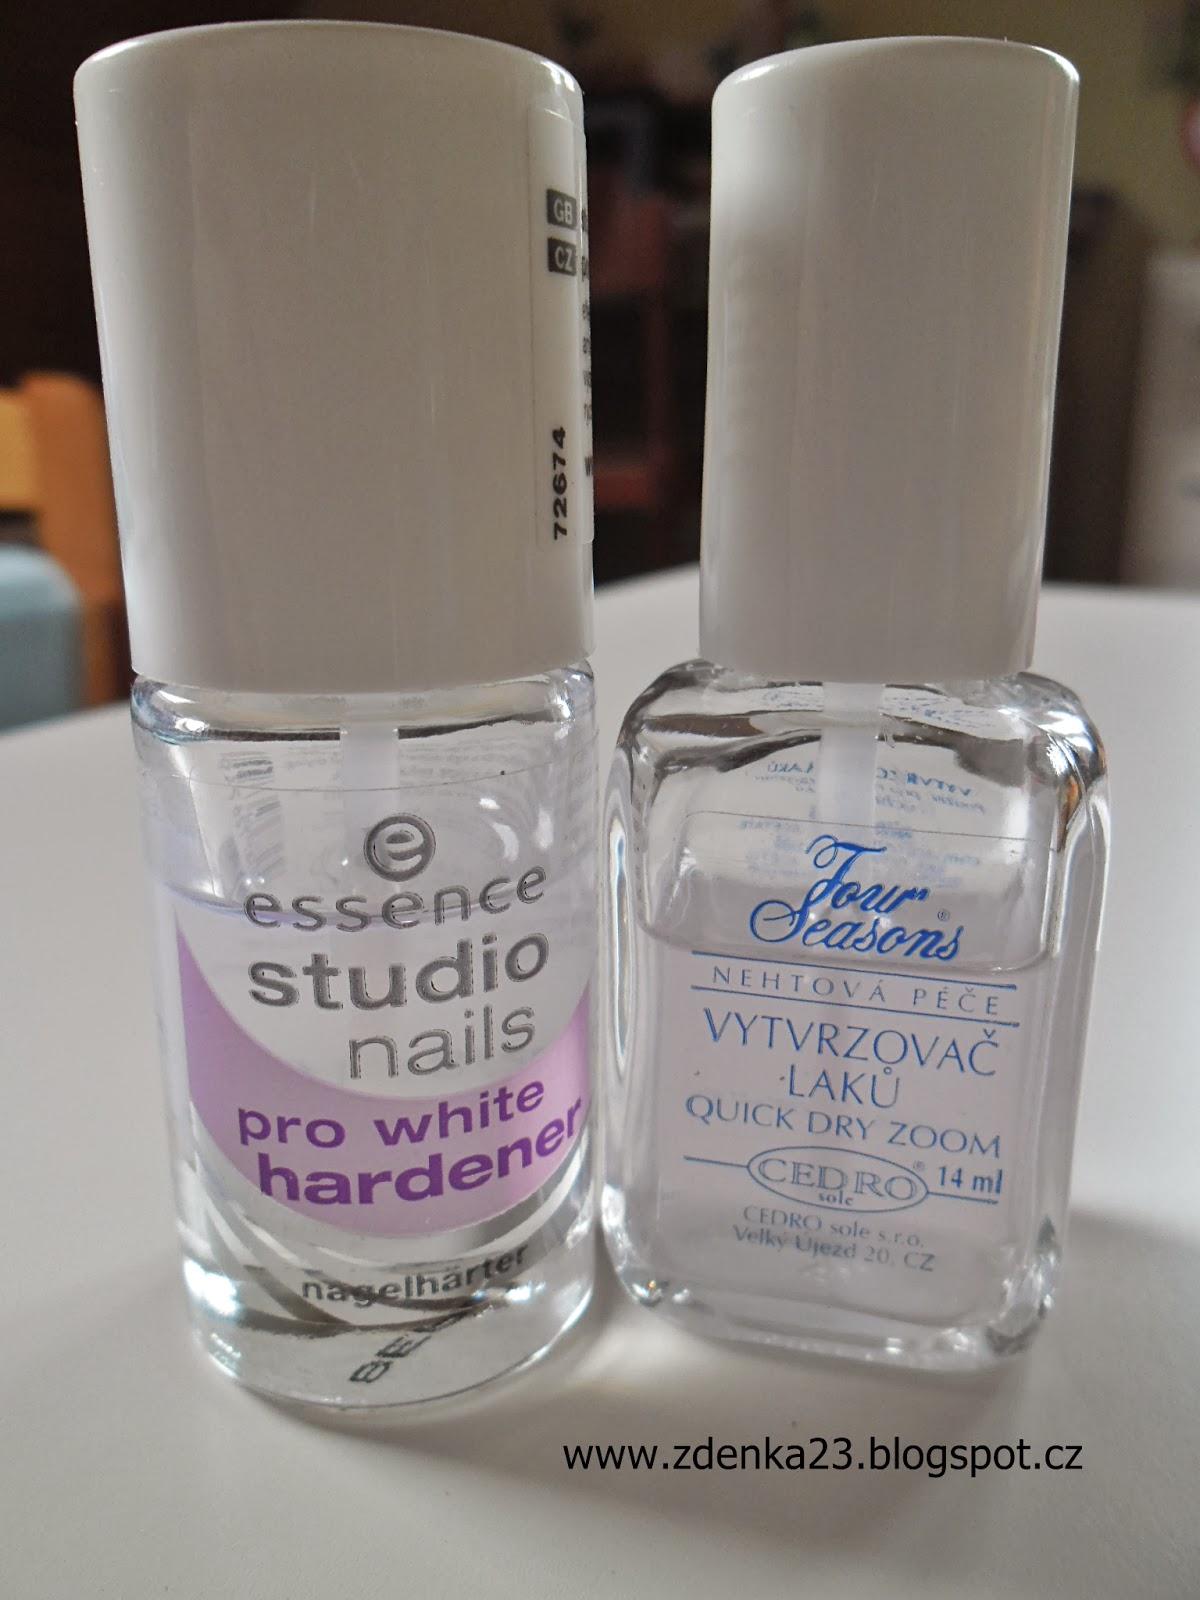 Zdenka Skodova Essence Studio Nails Pro White Hardener Four Seasons Vytvrzovac Laku